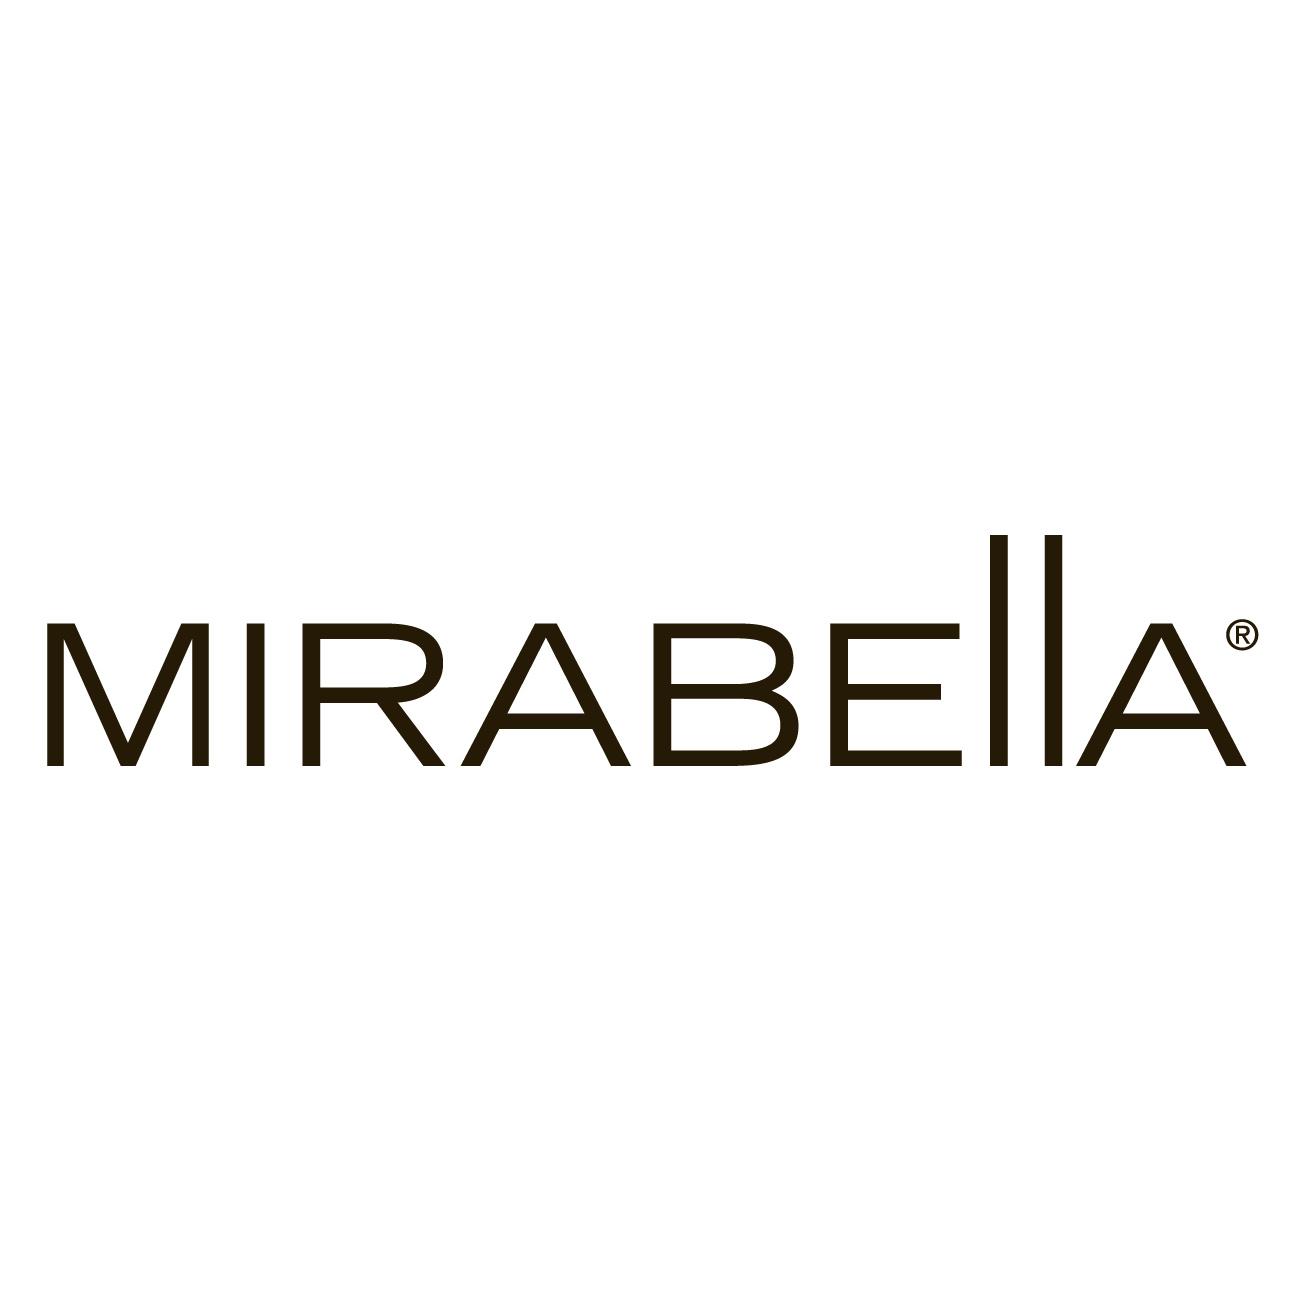 MIRABELLA_THUMB.jpg